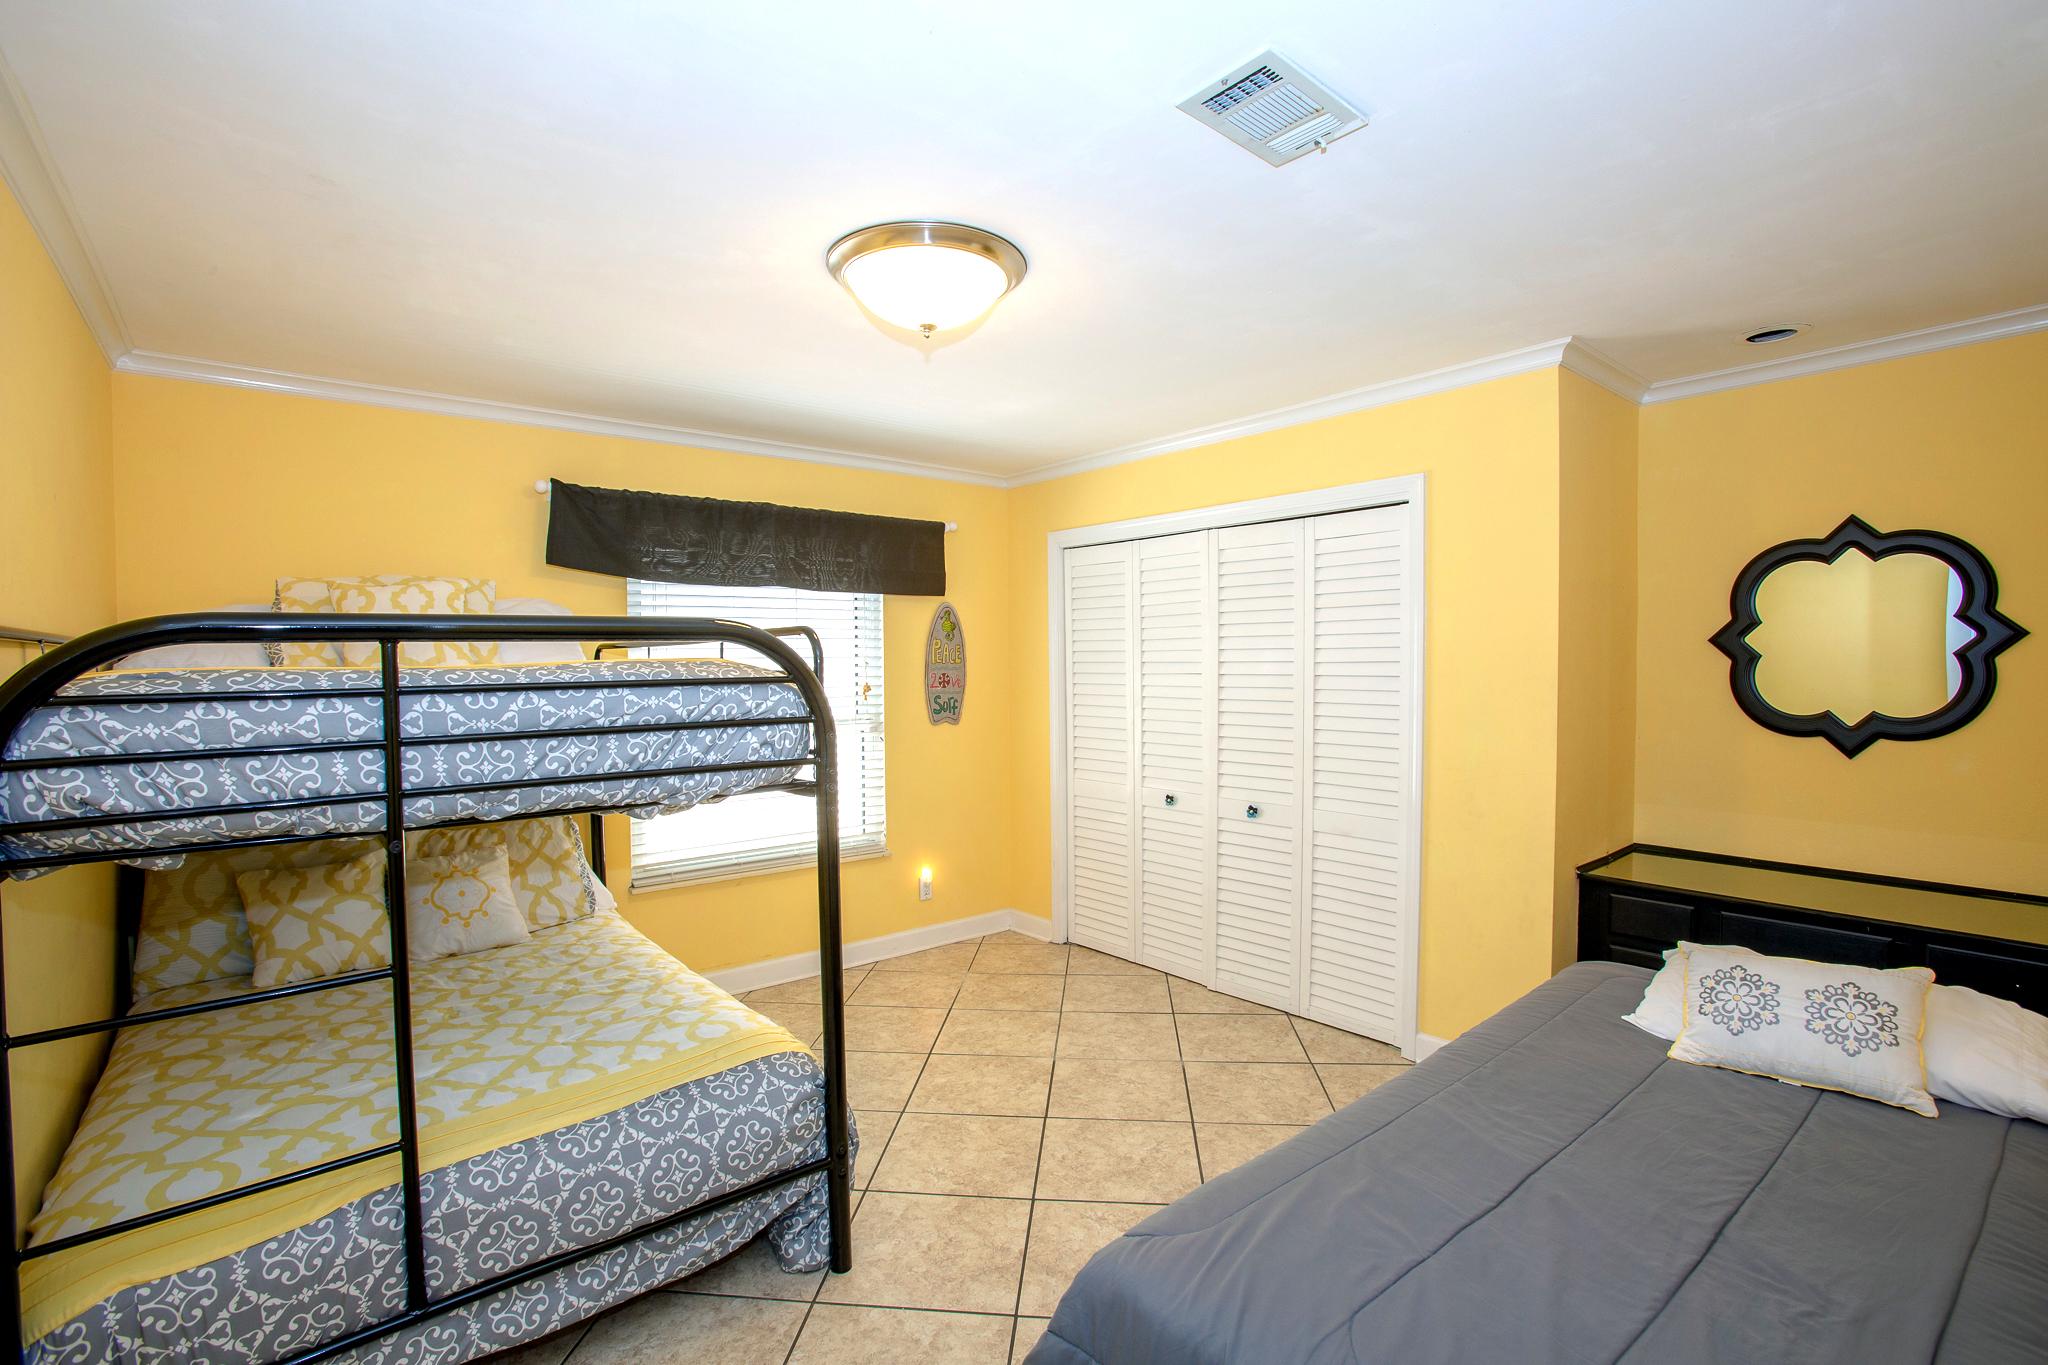 Maldonado 1015 - Sea the Big Picture House/Cottage rental in Pensacola Beach House Rentals in Pensacola Beach Florida - #16